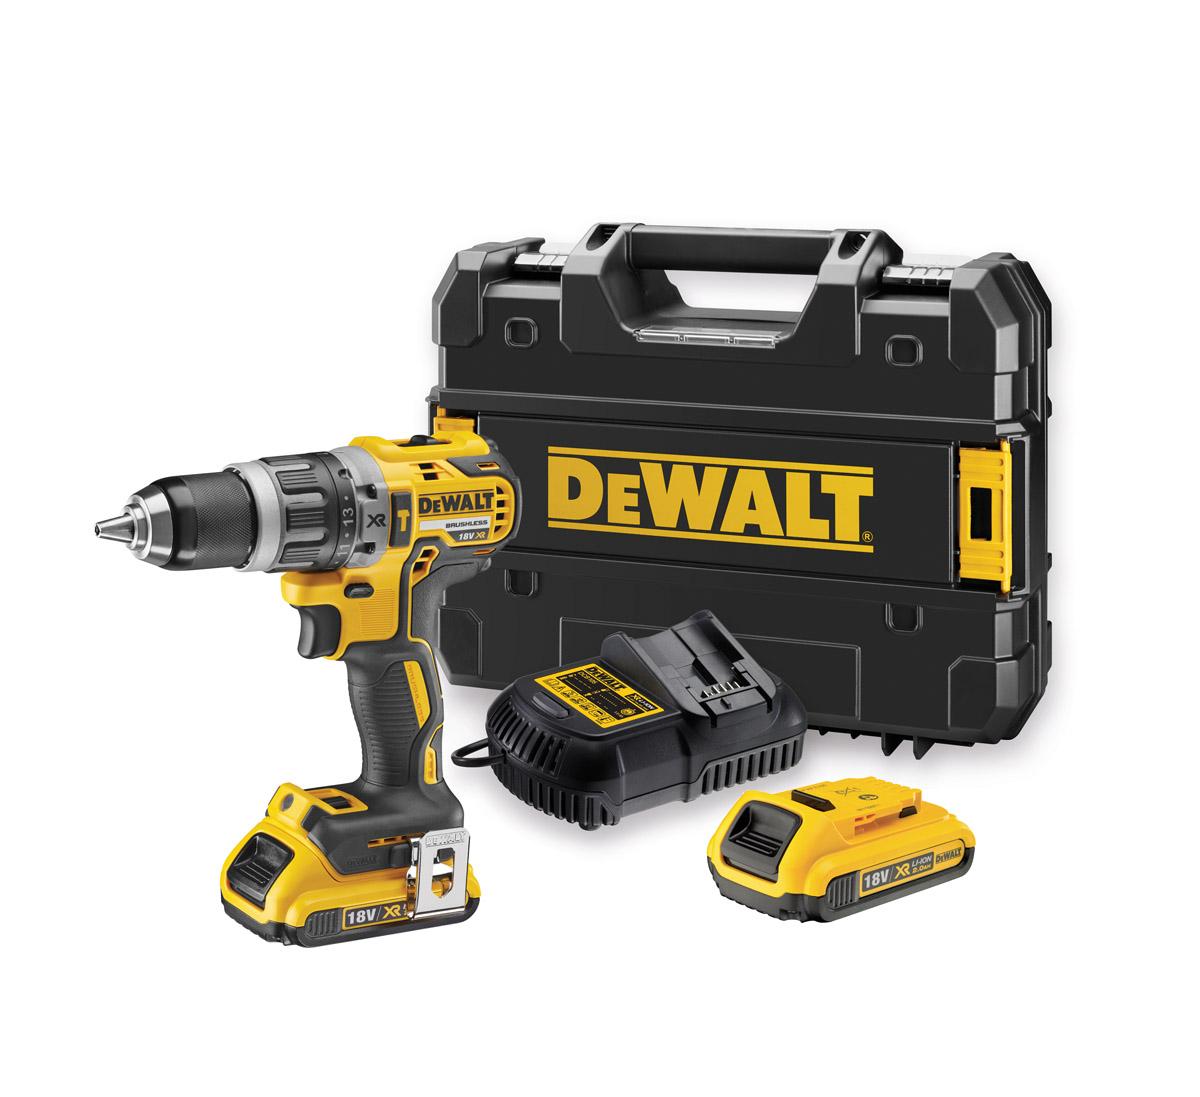 DeWALT DCD796D2-GB - 18V XR Li-Ion Brushless 13mm Compact Hammer Drill Driver